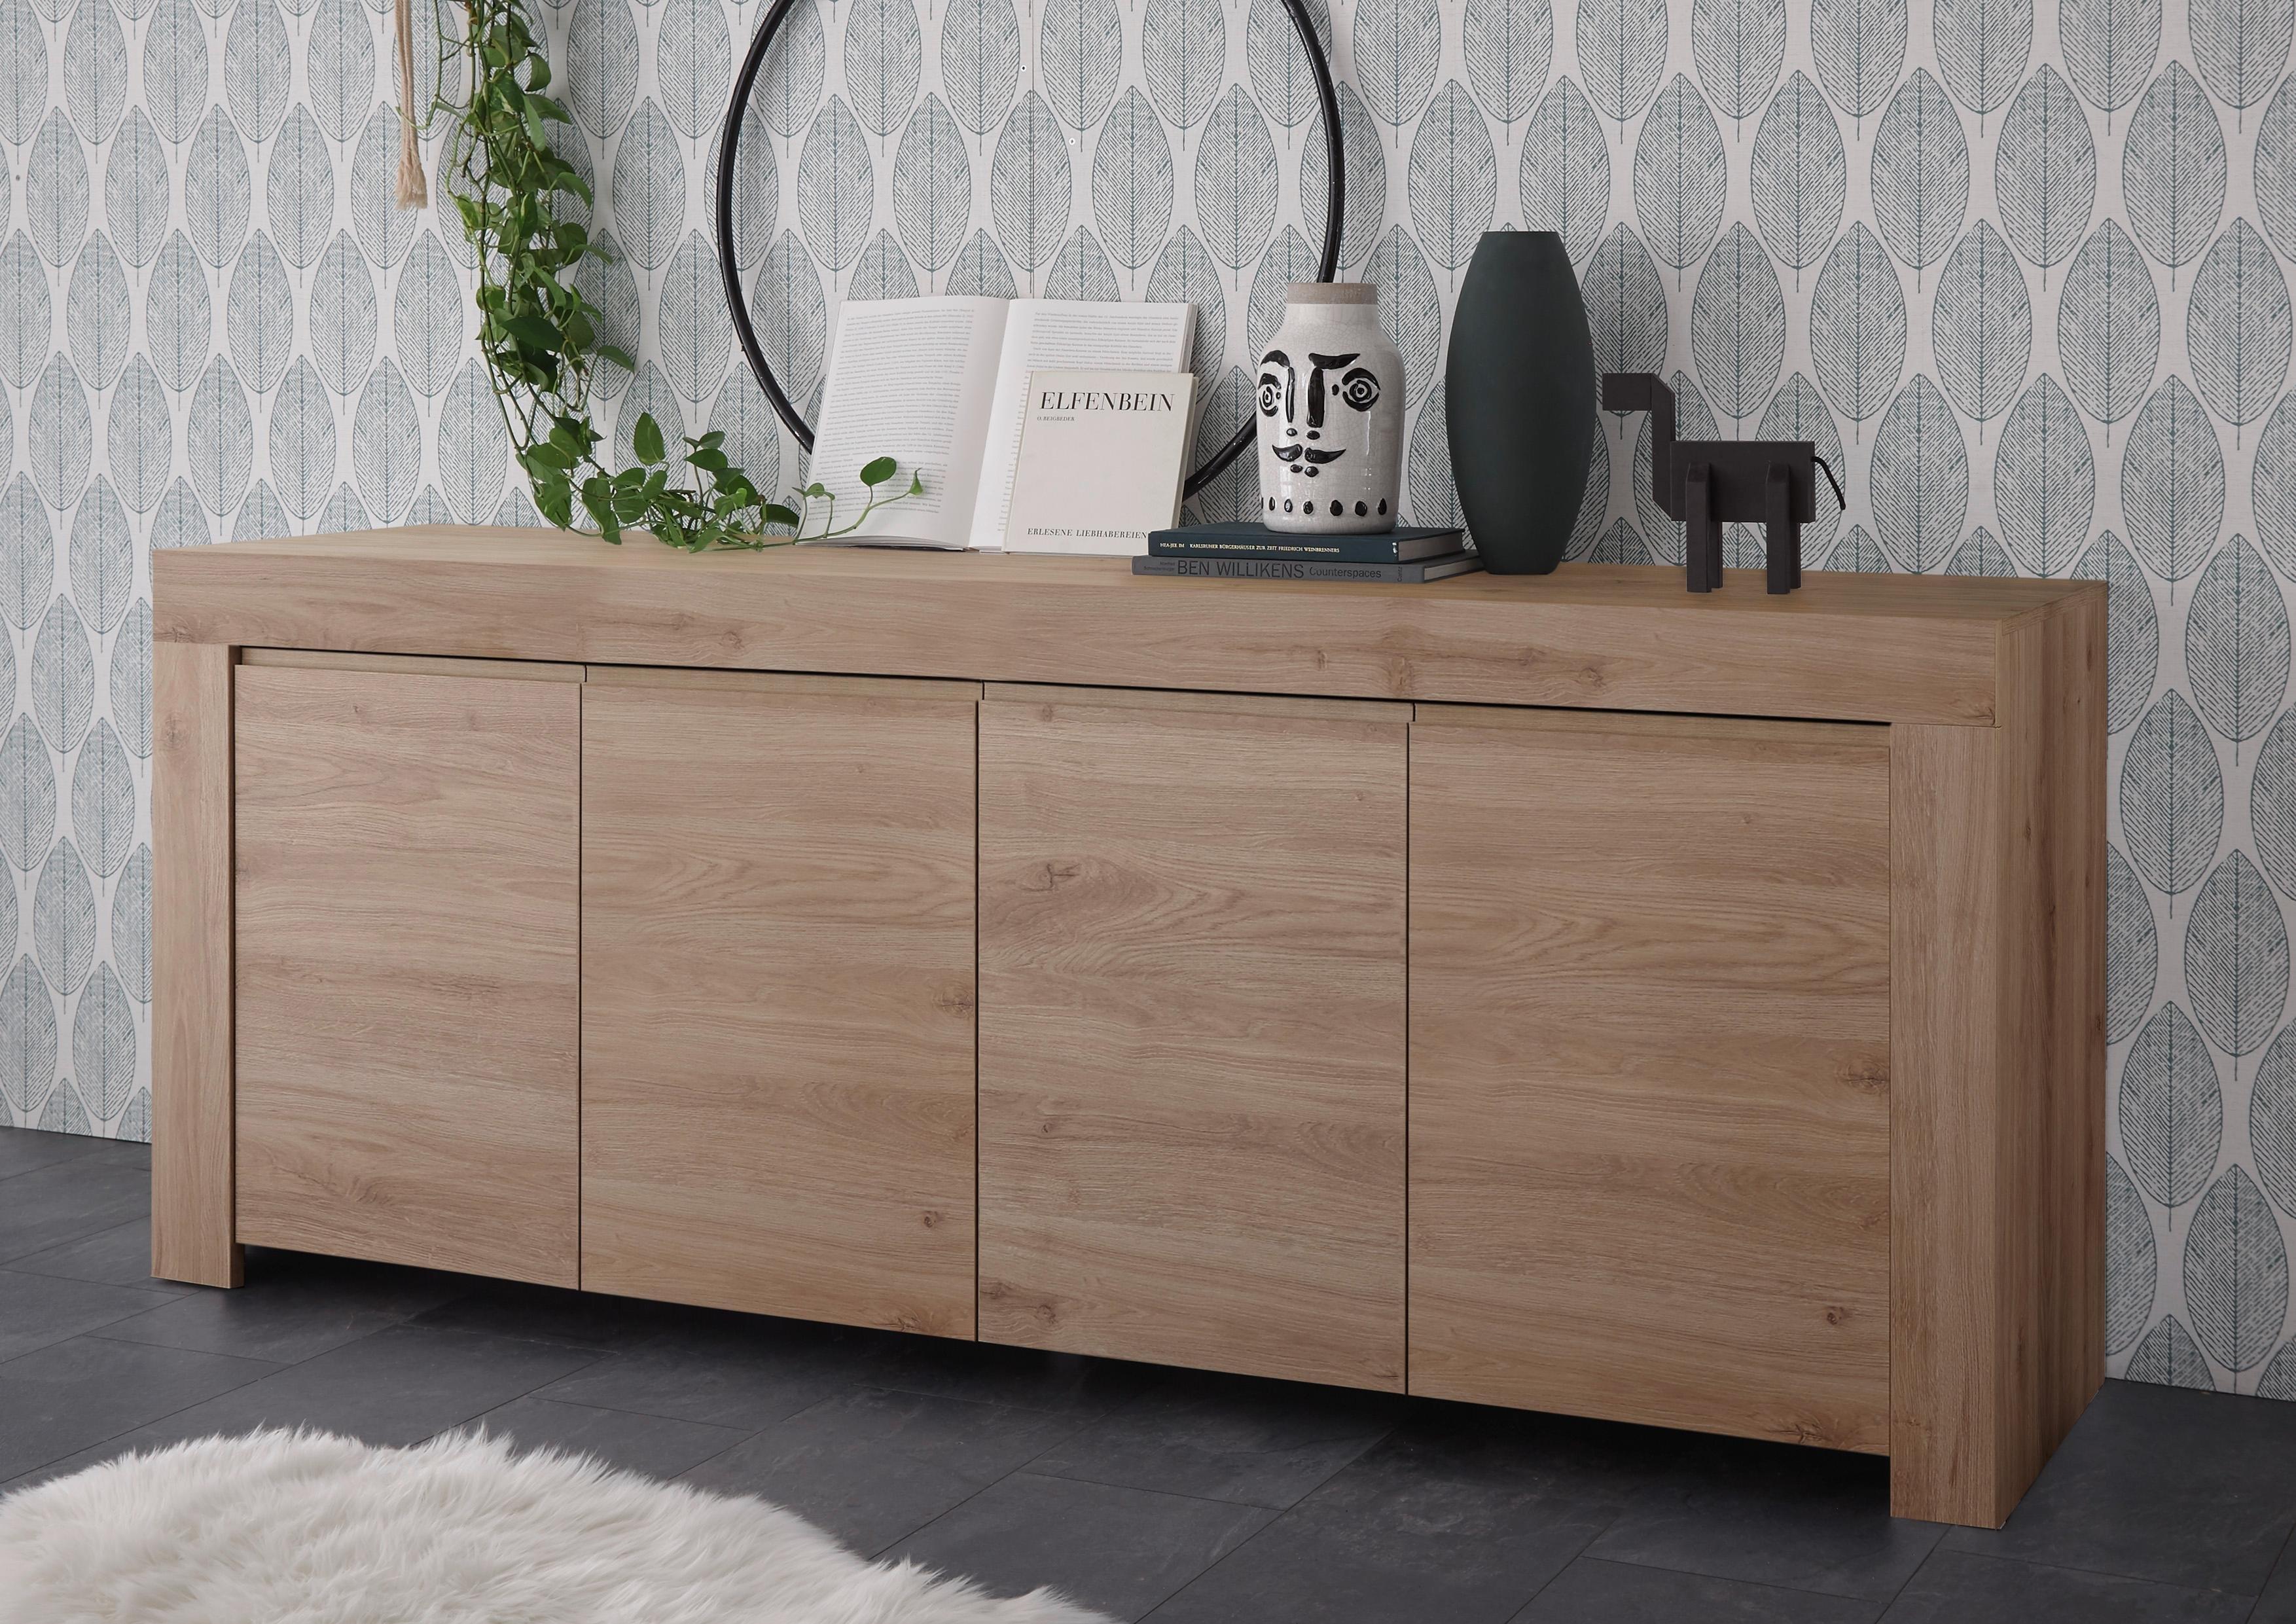 LC dressoir »Firenze«, breedte 210 cm bij OTTO online kopen